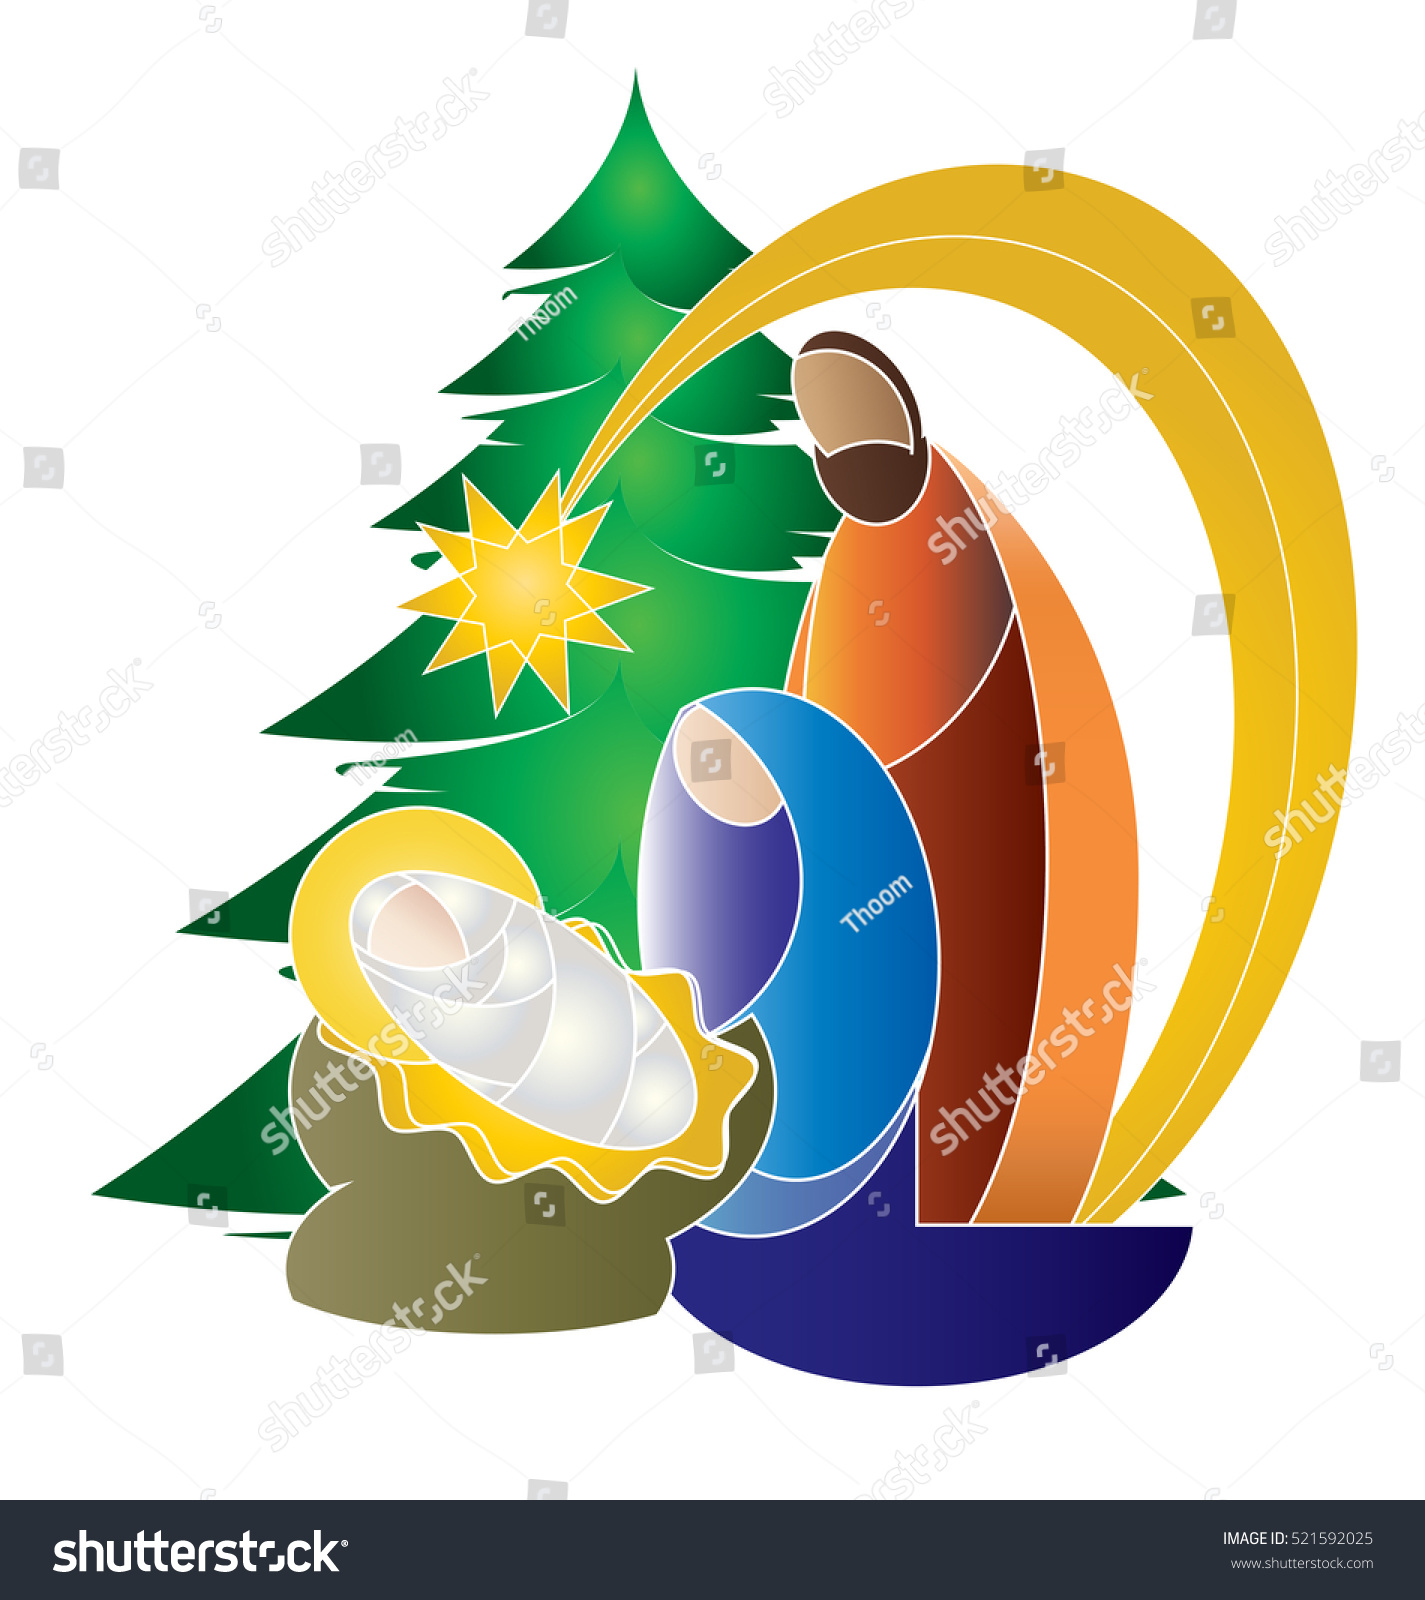 Christmas Nativity Religious Bethlehem Crib Scene Stock ...